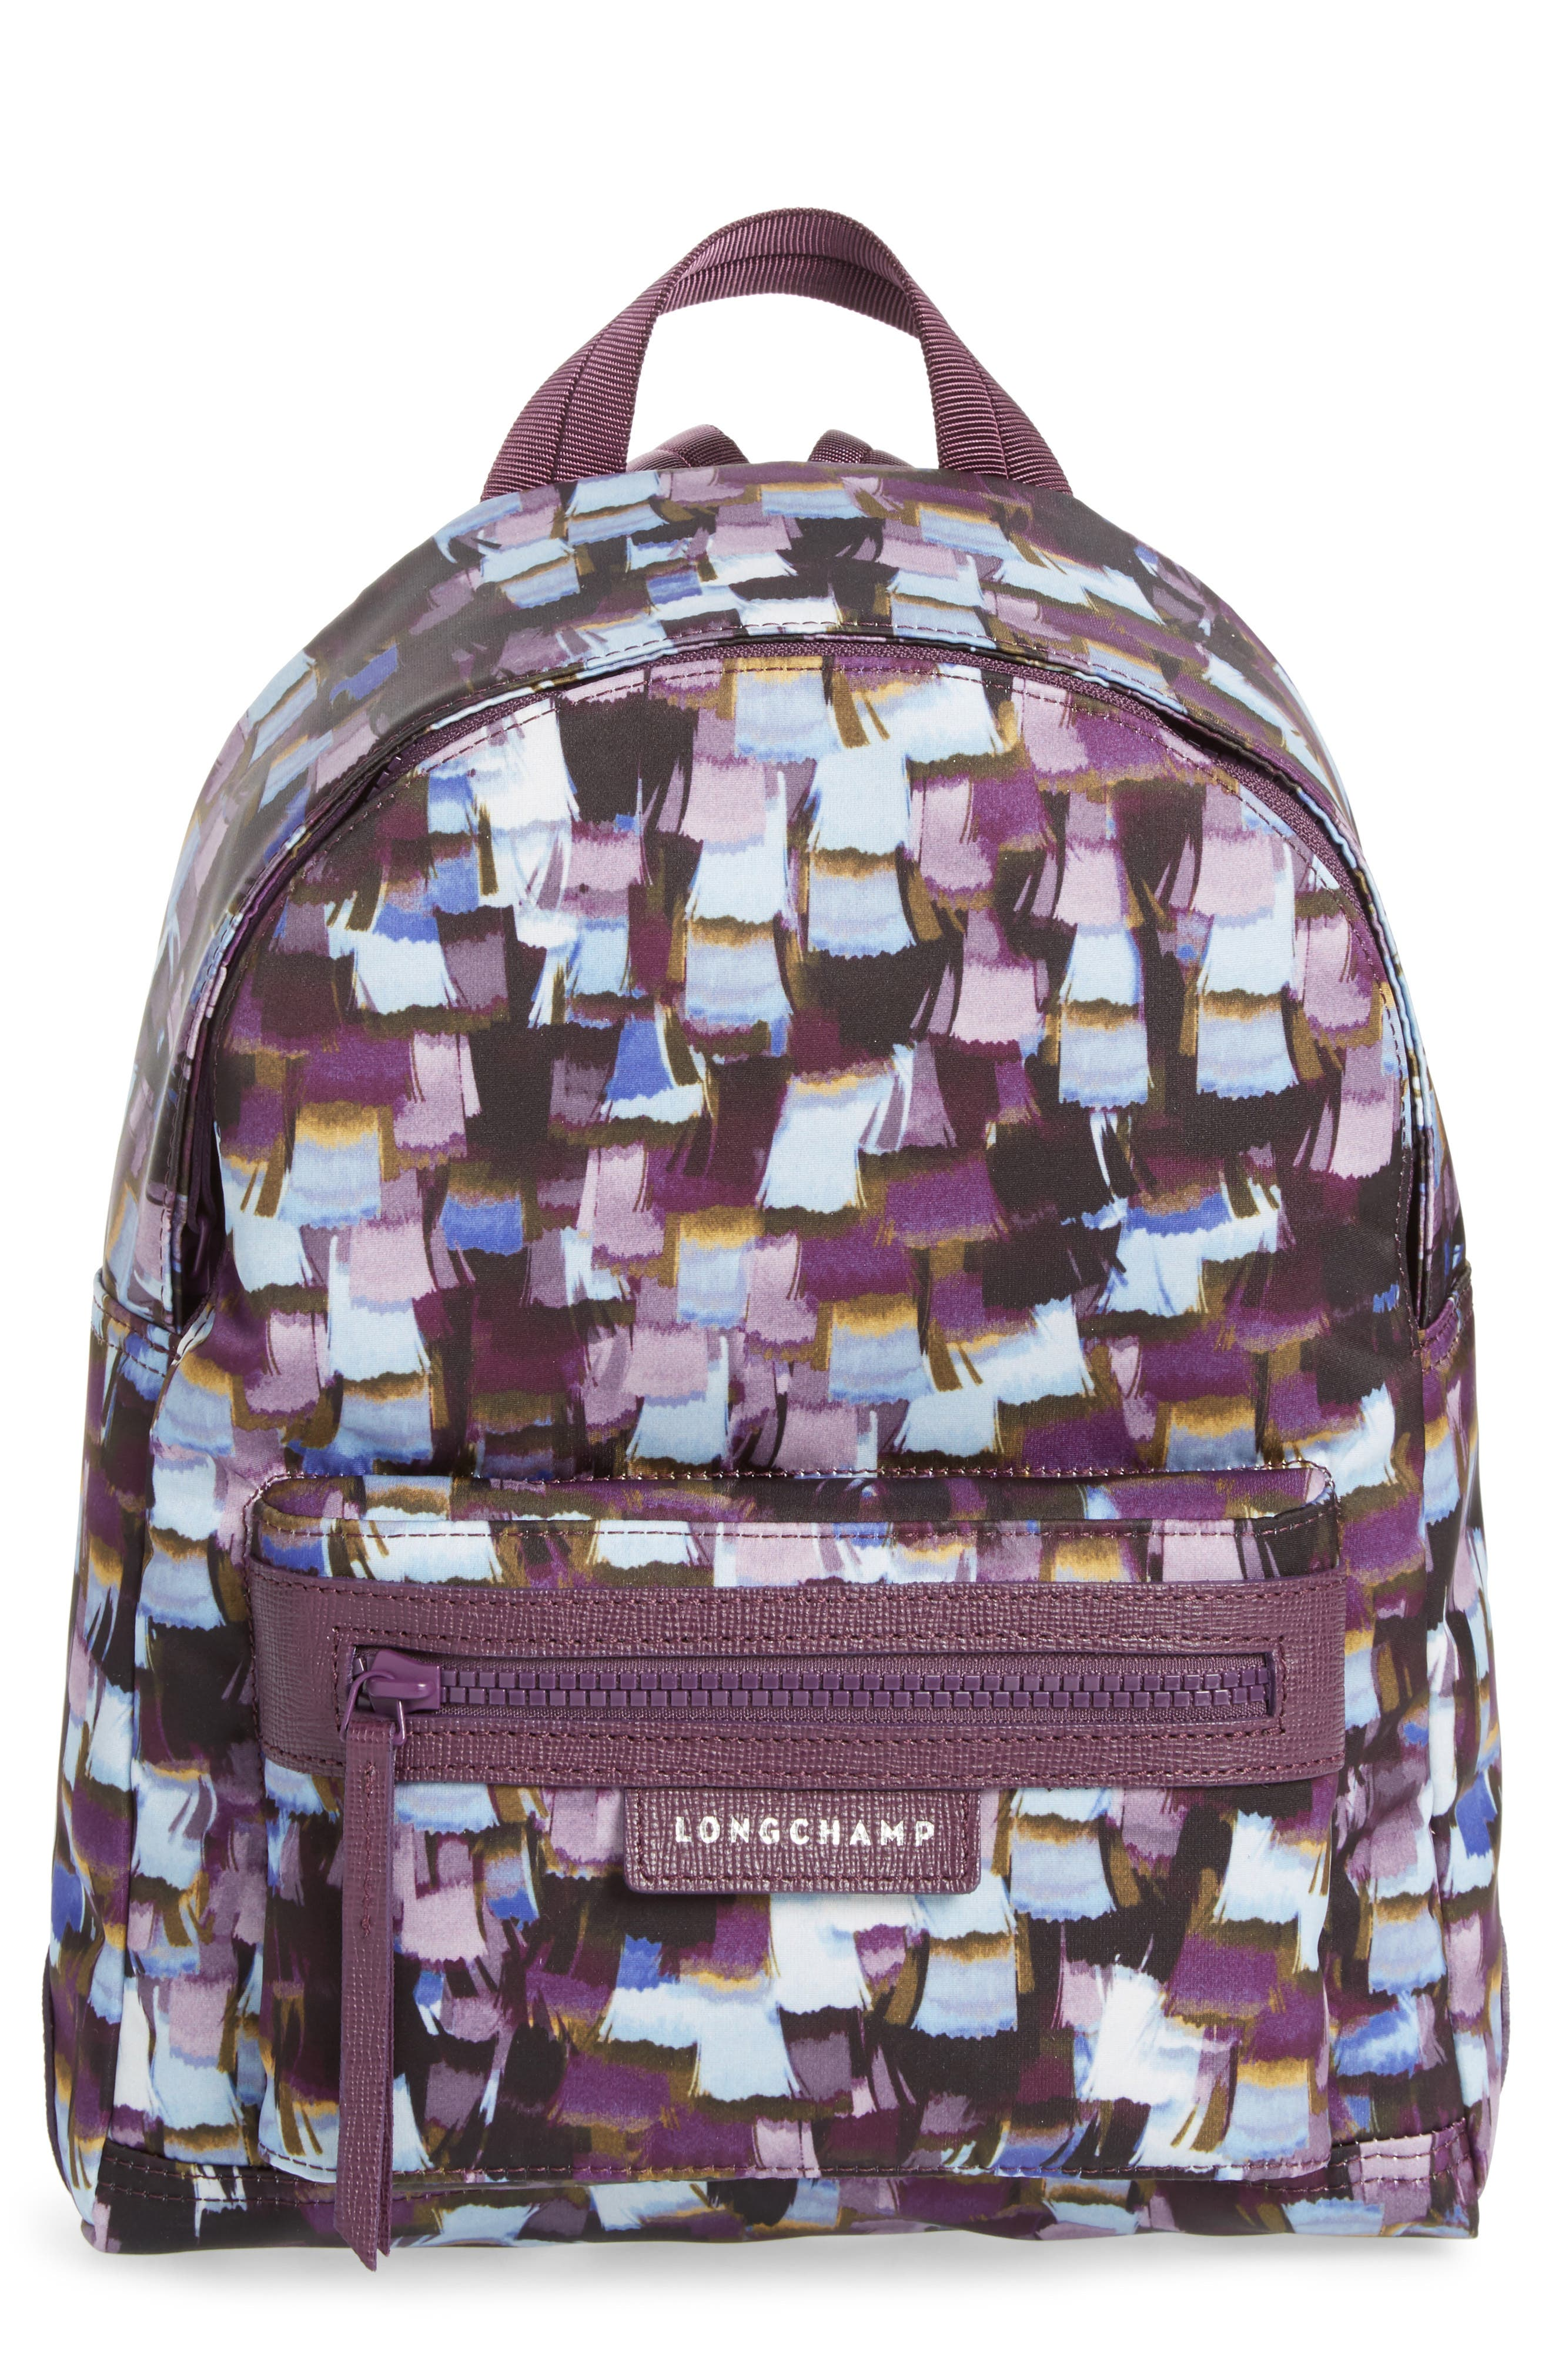 Alternate Image 1 Selected - Longchamp Le Pliage Neo - Vibrations Nylon Backpack